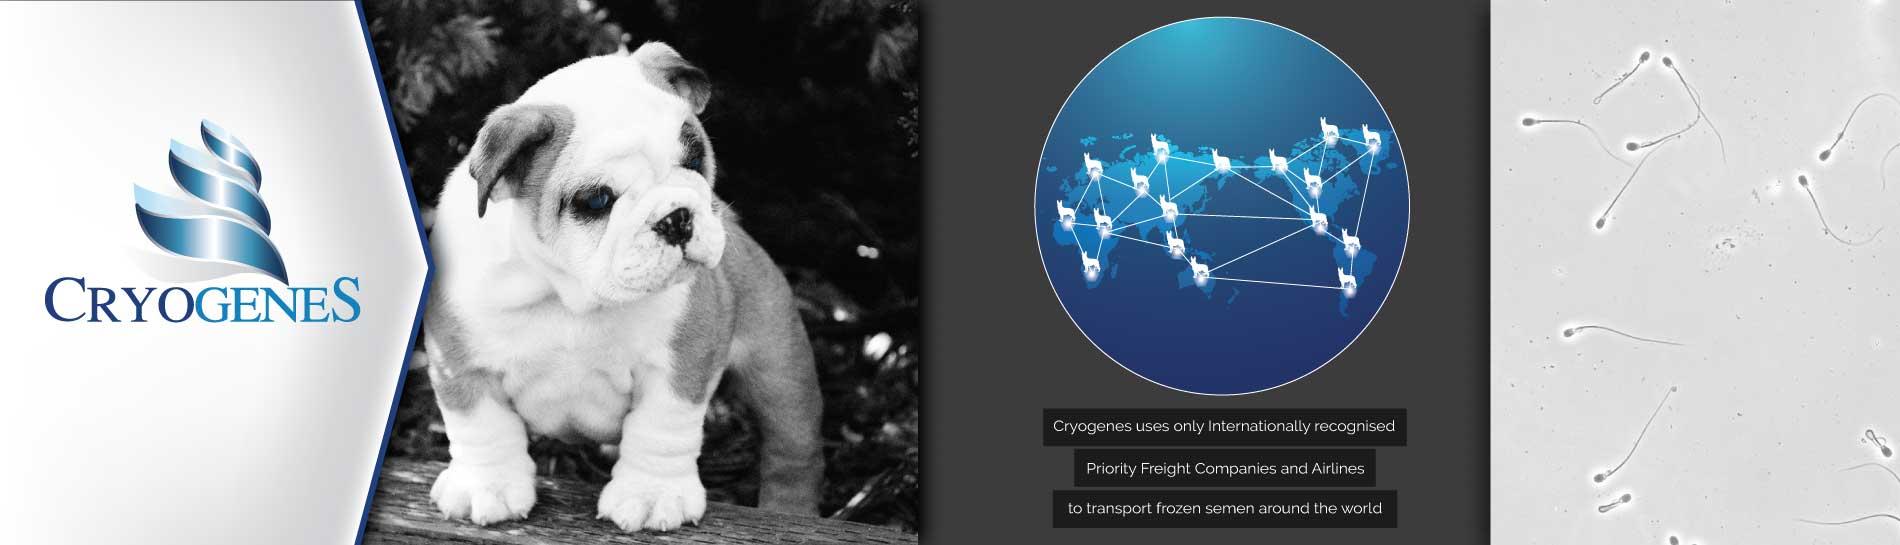 Exports Cryogenes - Canine Frozen Semen Transportation